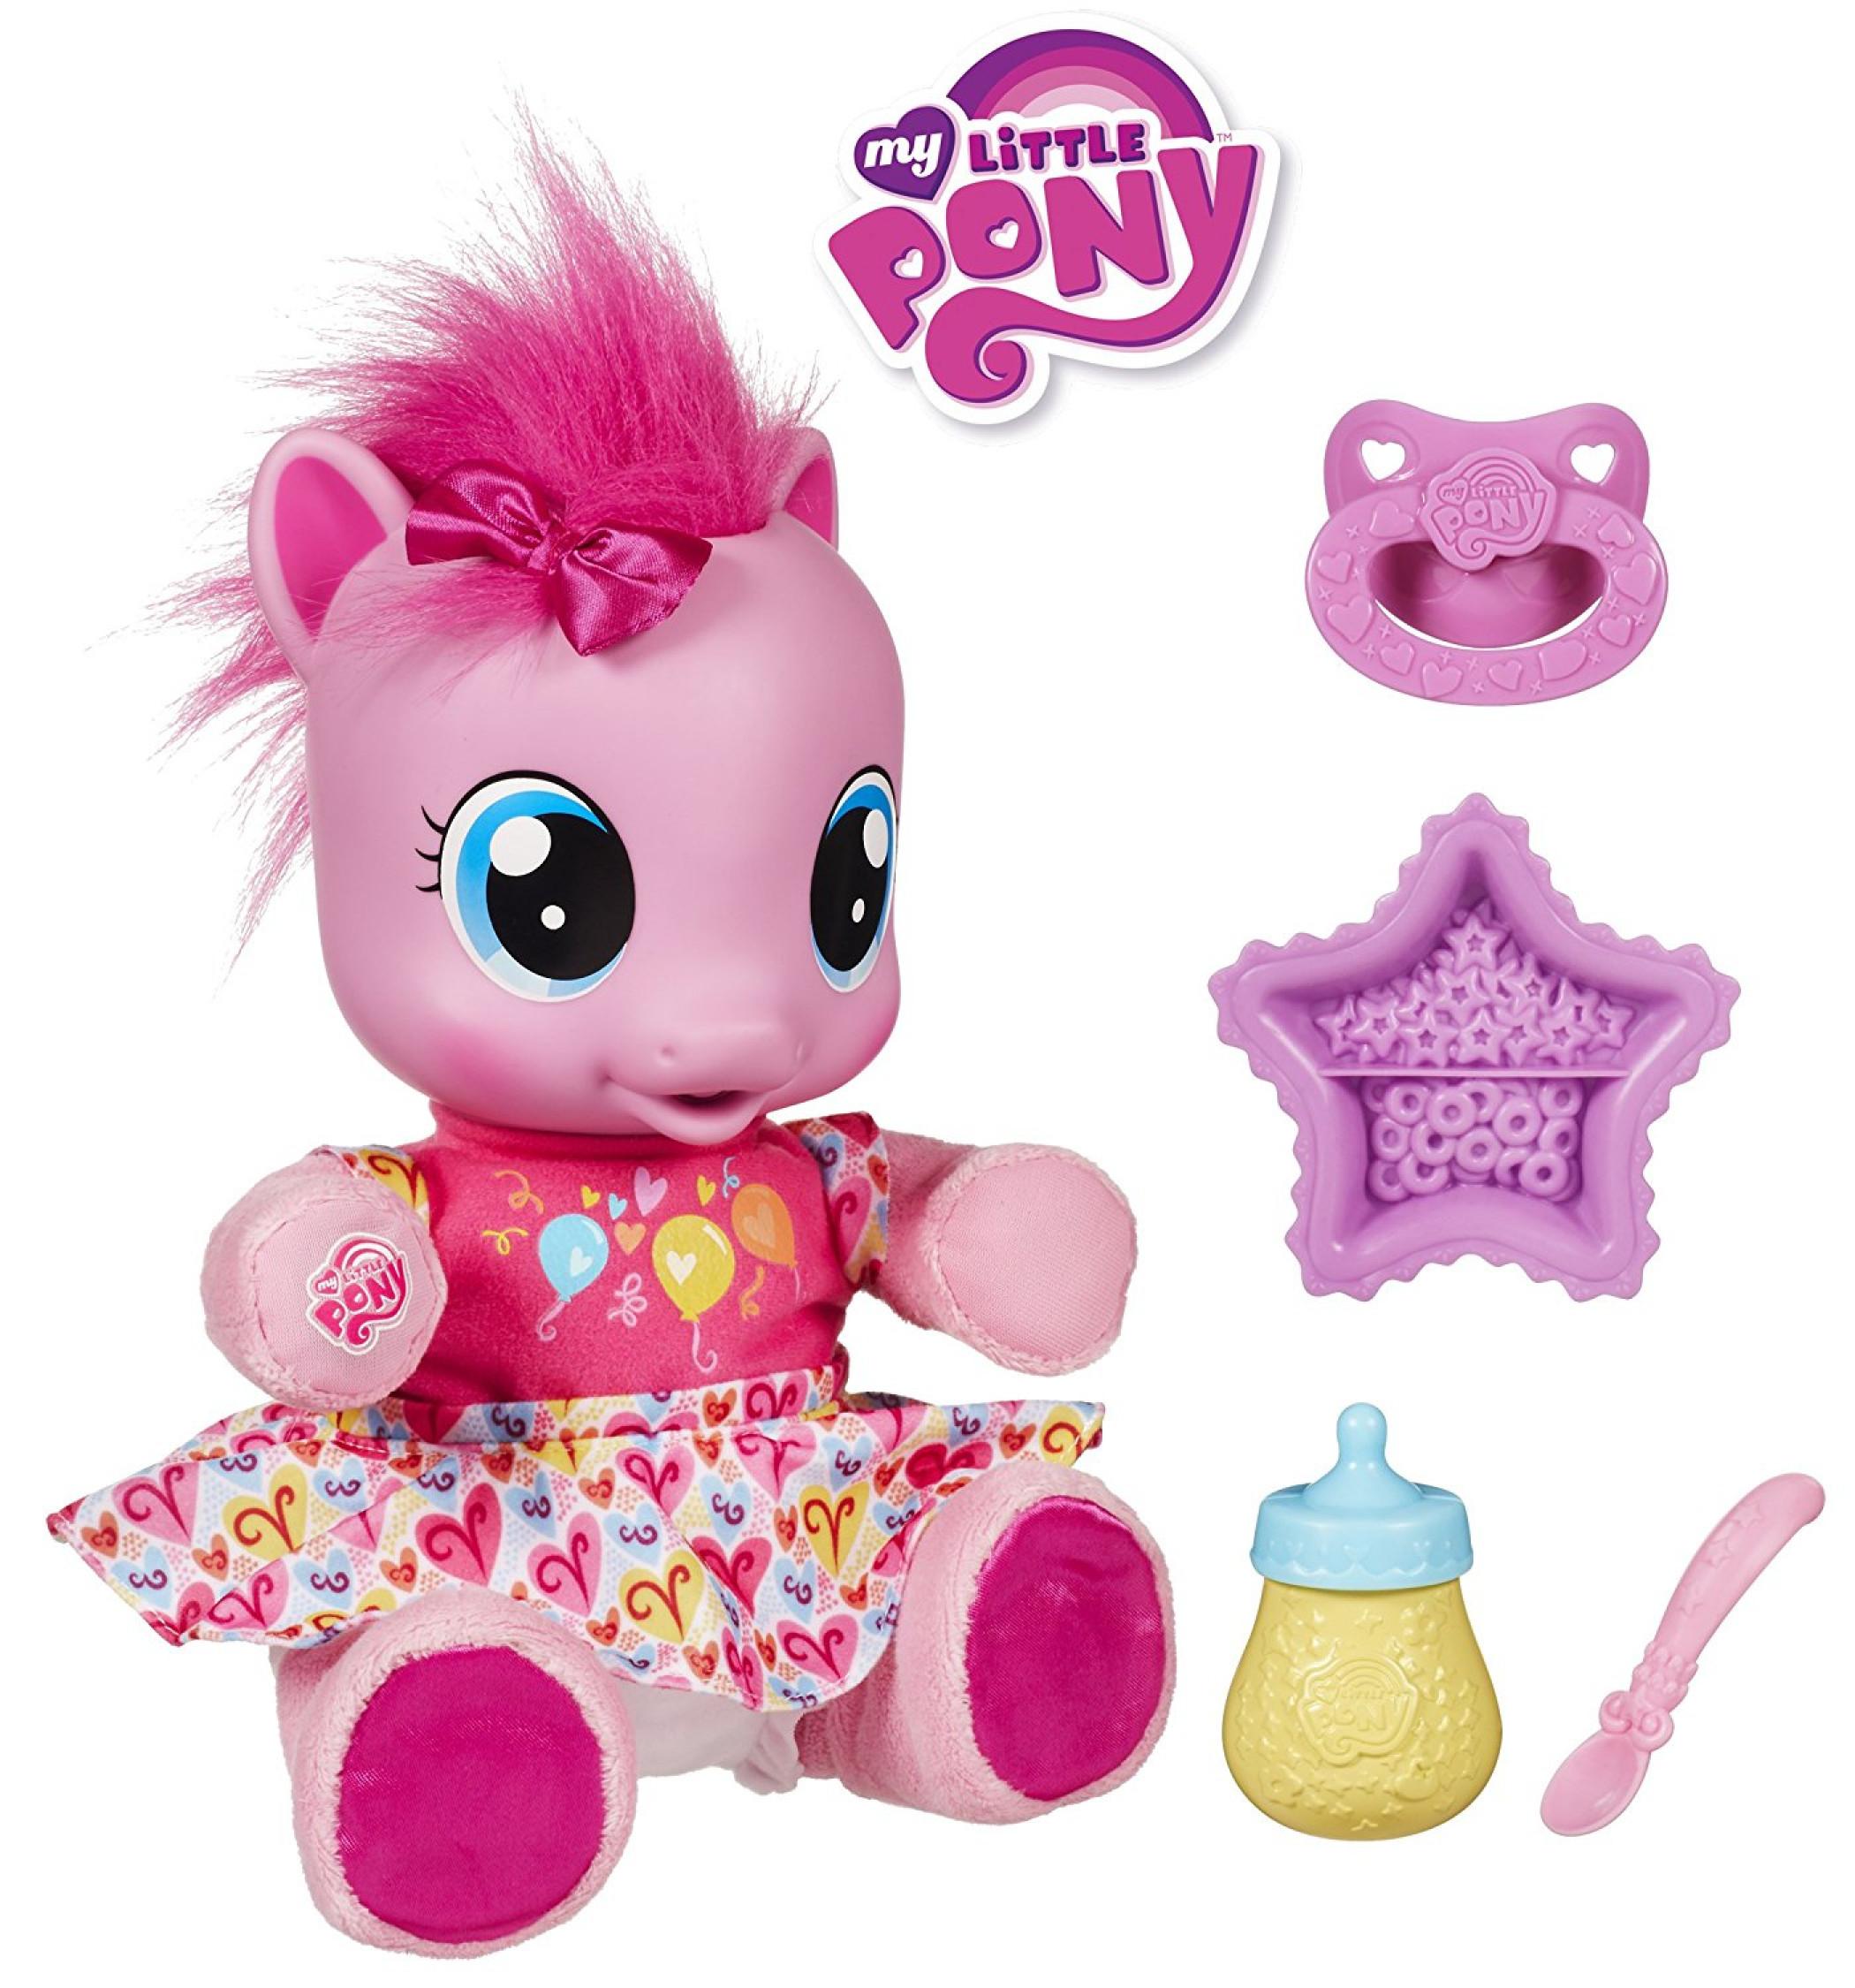 my little pony so soft pinkie pie erste schritte puppe hasbro ebay. Black Bedroom Furniture Sets. Home Design Ideas